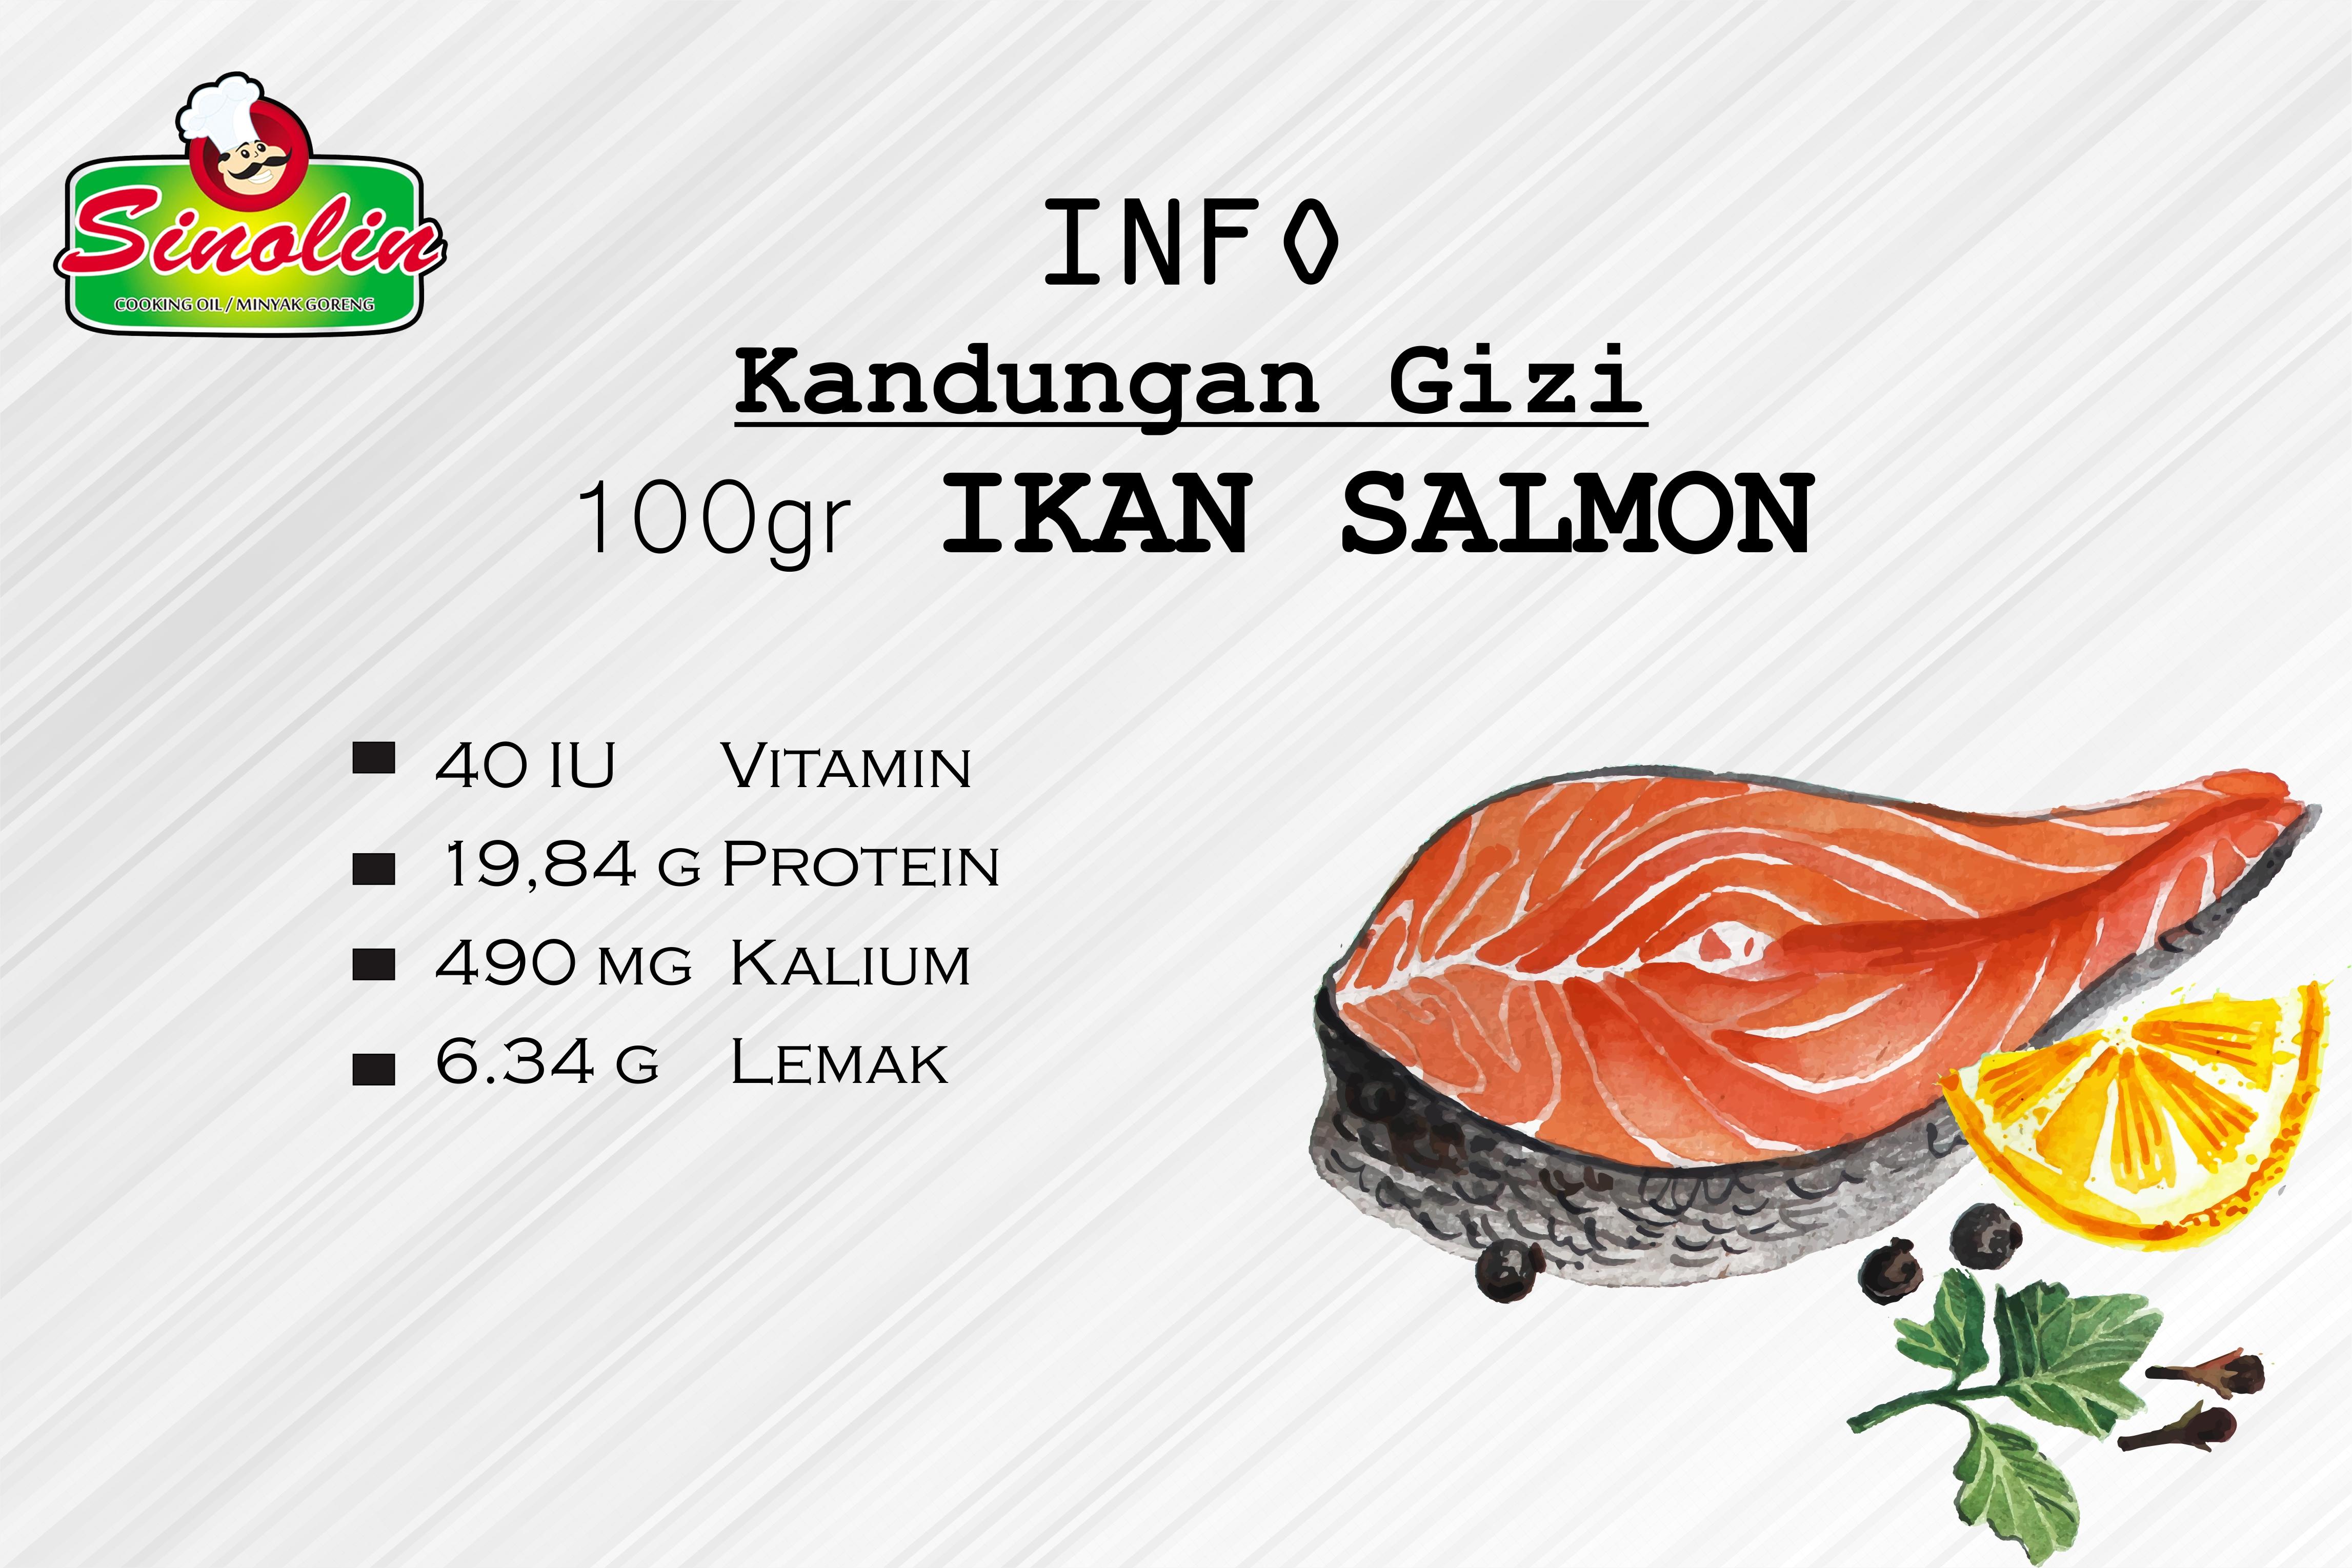 Info: Kandungan Gizi Dan Manfaat Ikan Salmon Untuk Kesehatan oleh Dapur Sinolin